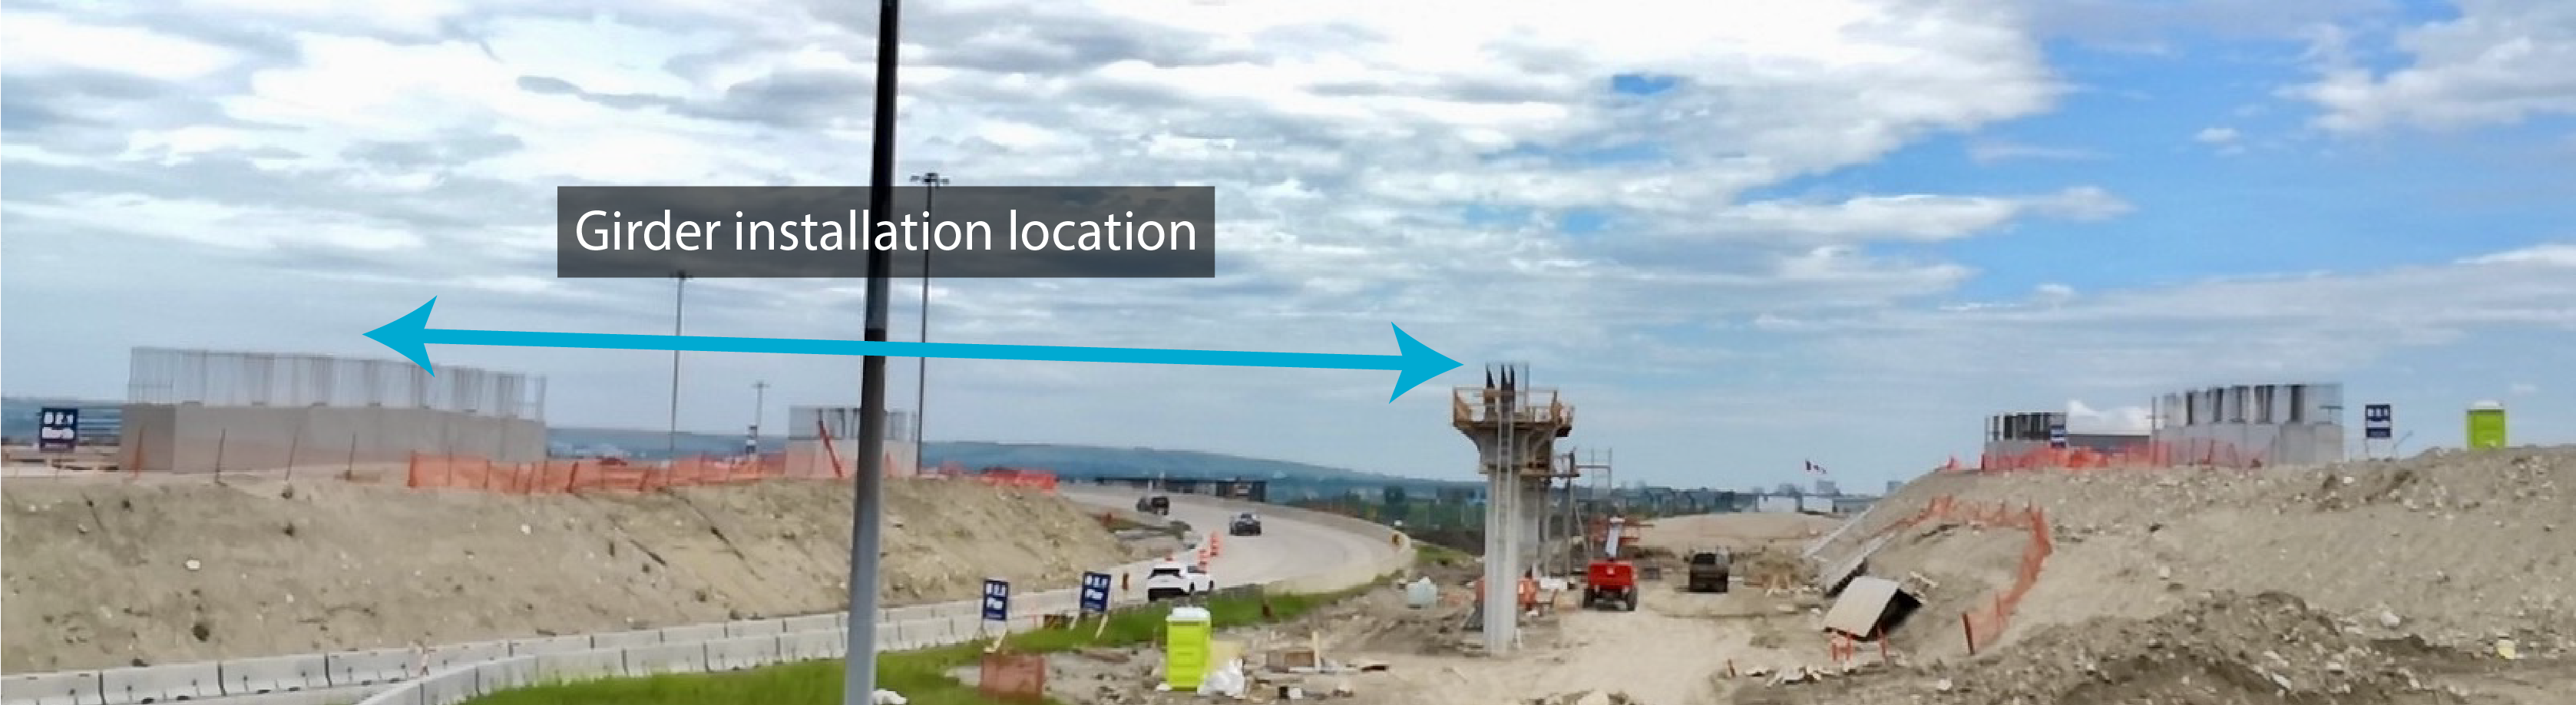 Girder installation location